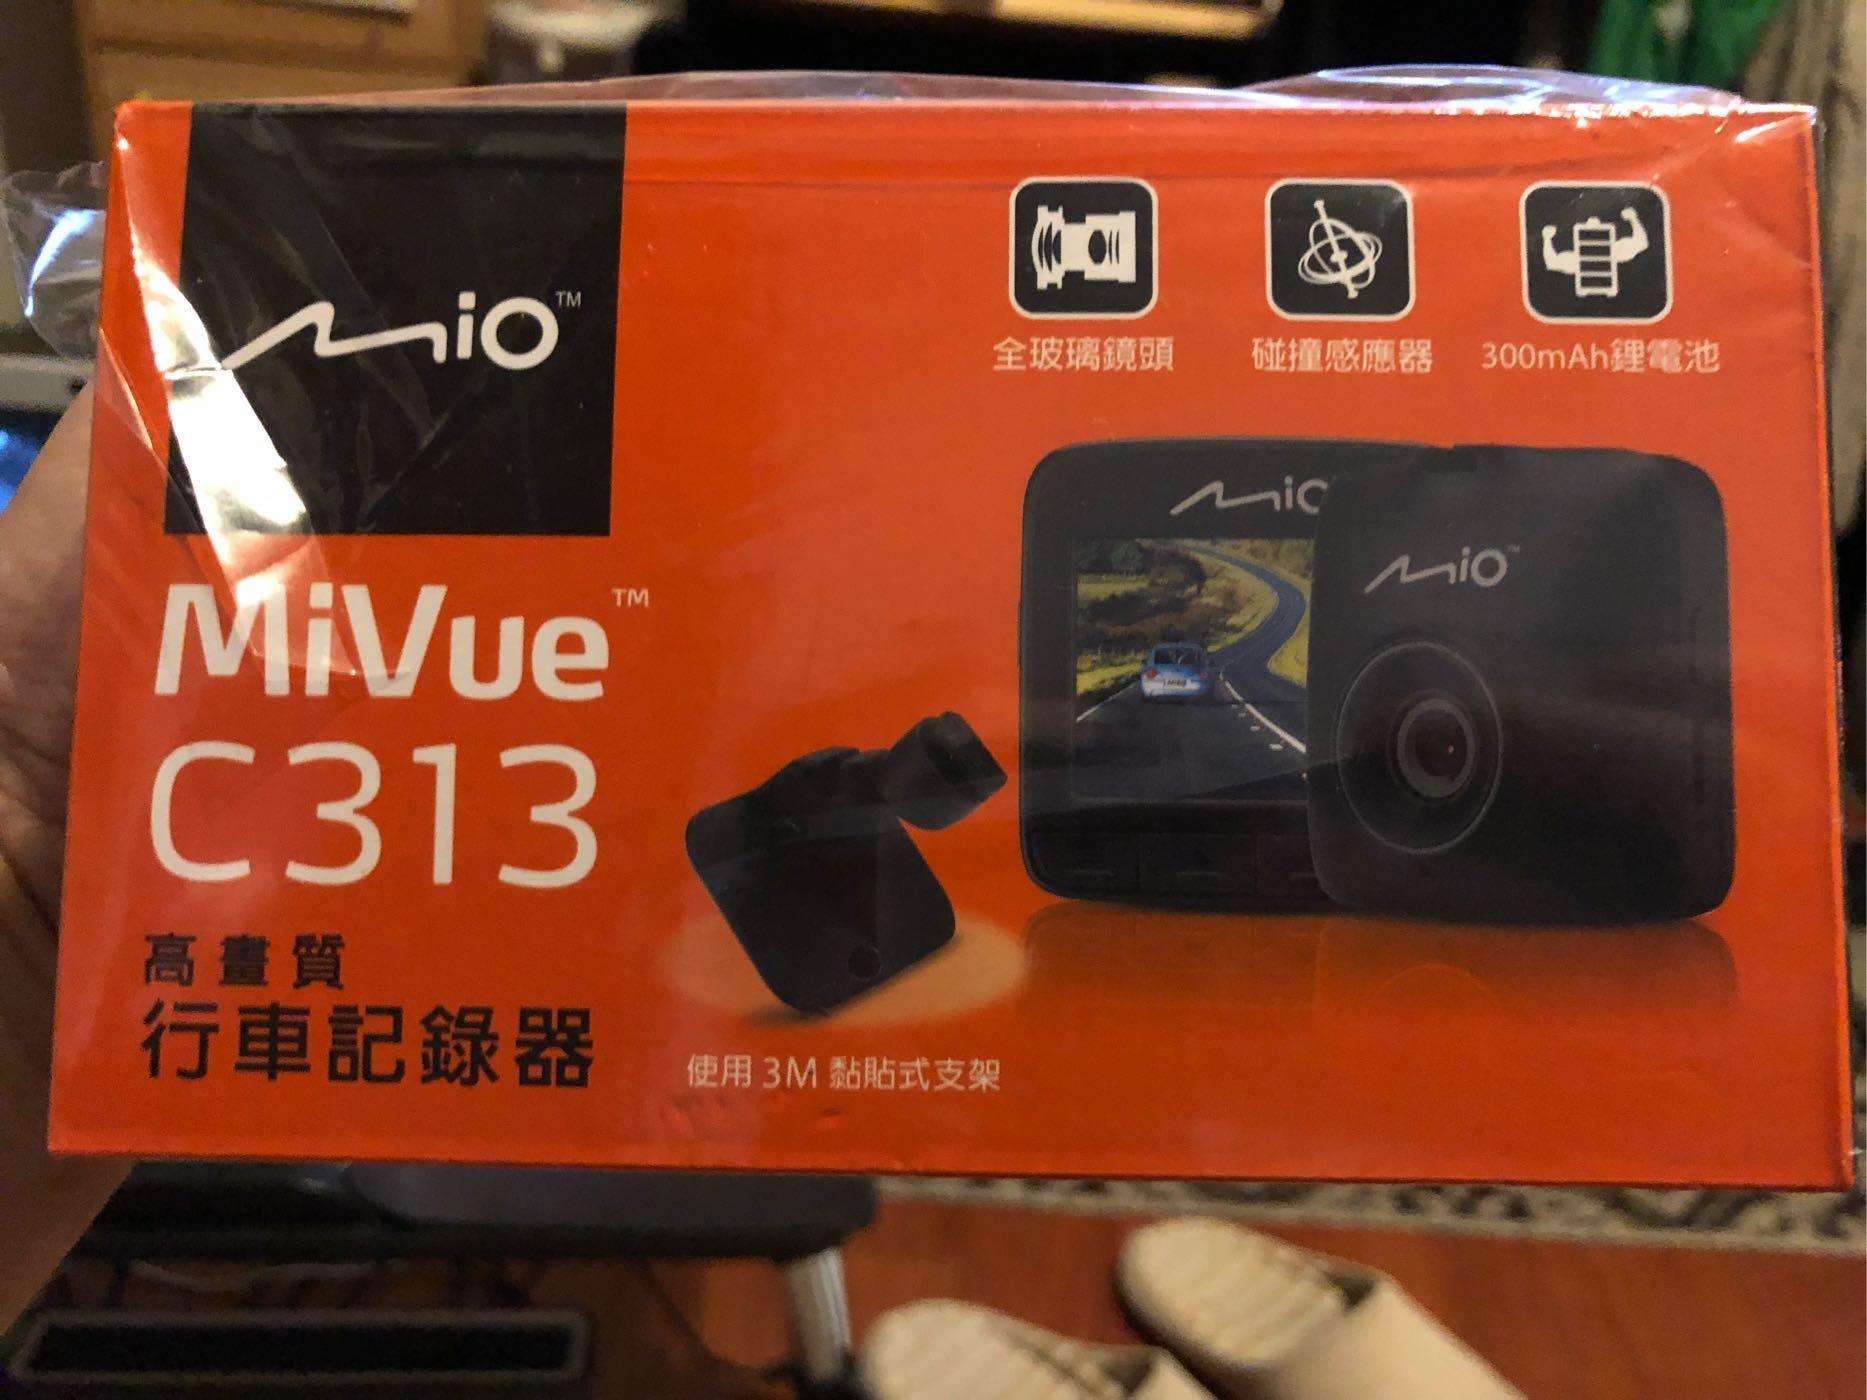 MIO MiVue™ C313 高畫質1080P行車記錄器